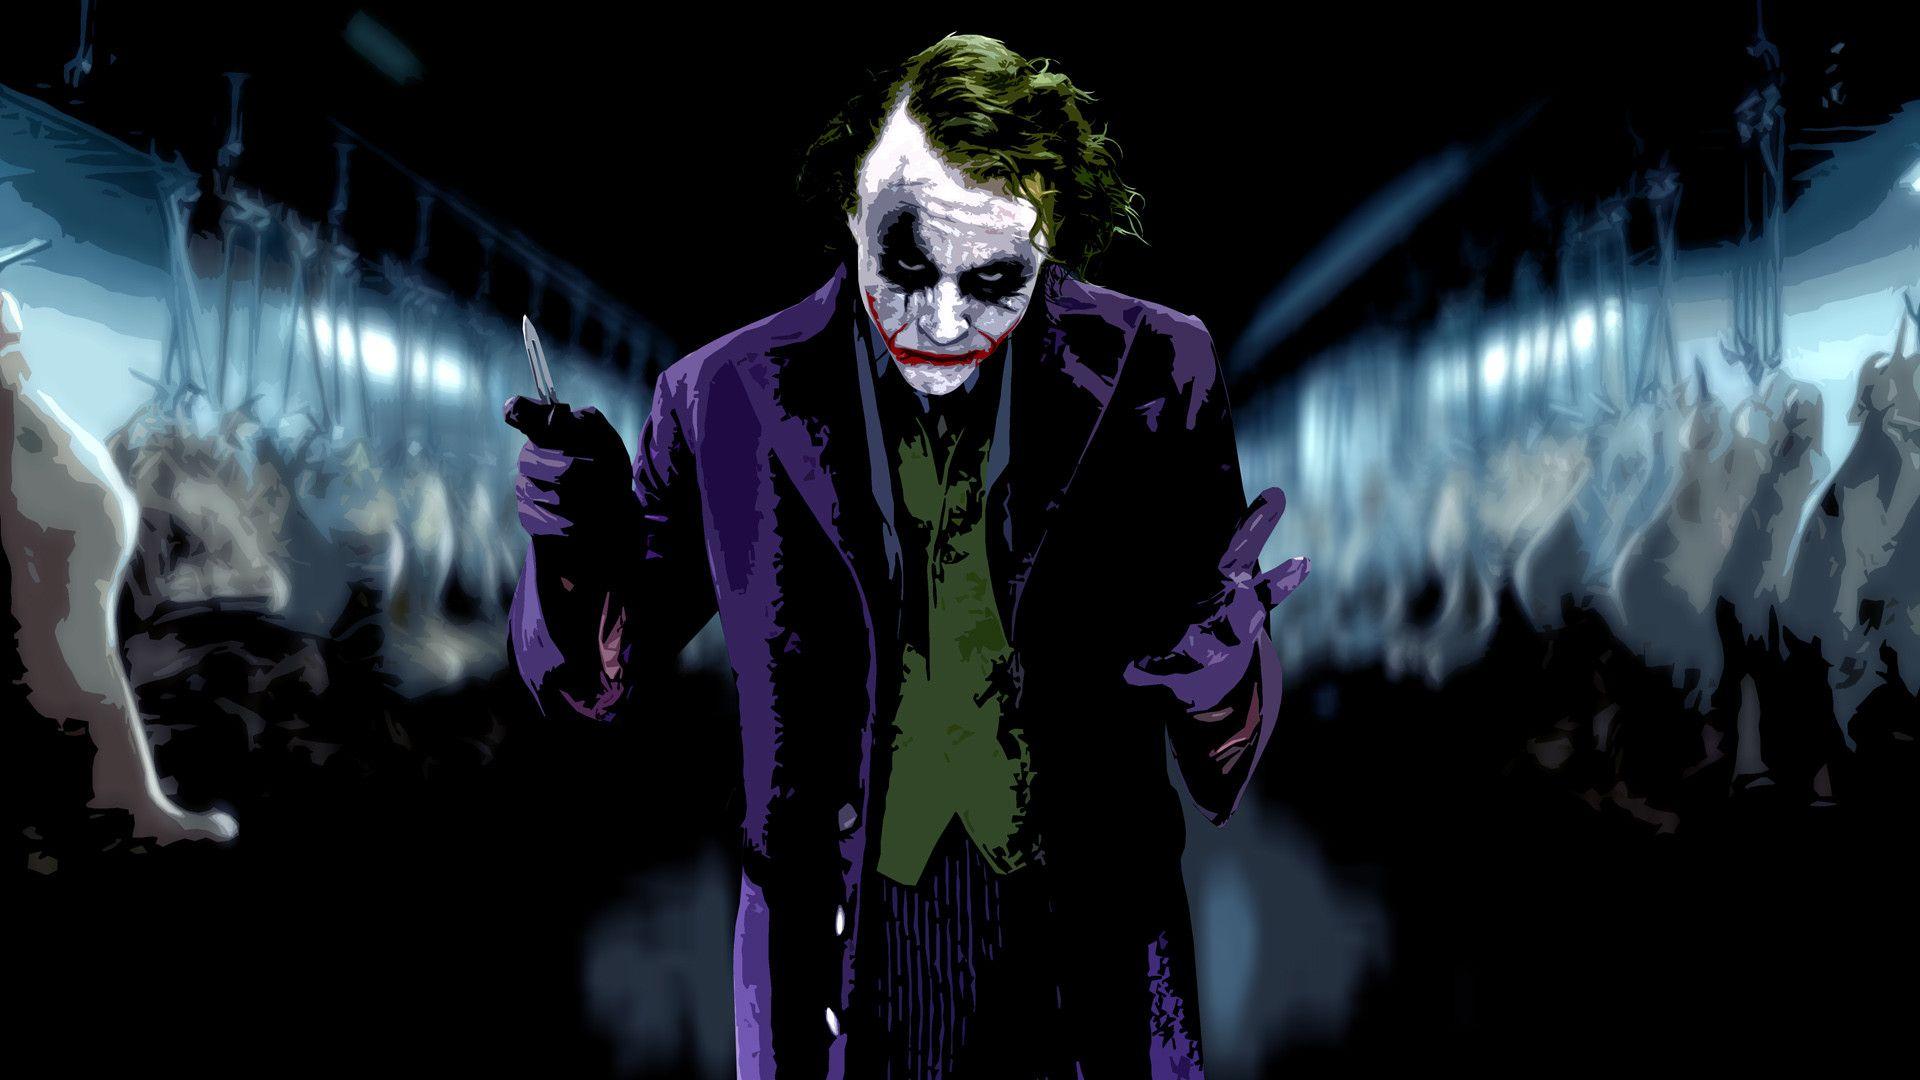 Wow 5 Foto Joker Hd Seram - Arti Gambar in 5  Joker